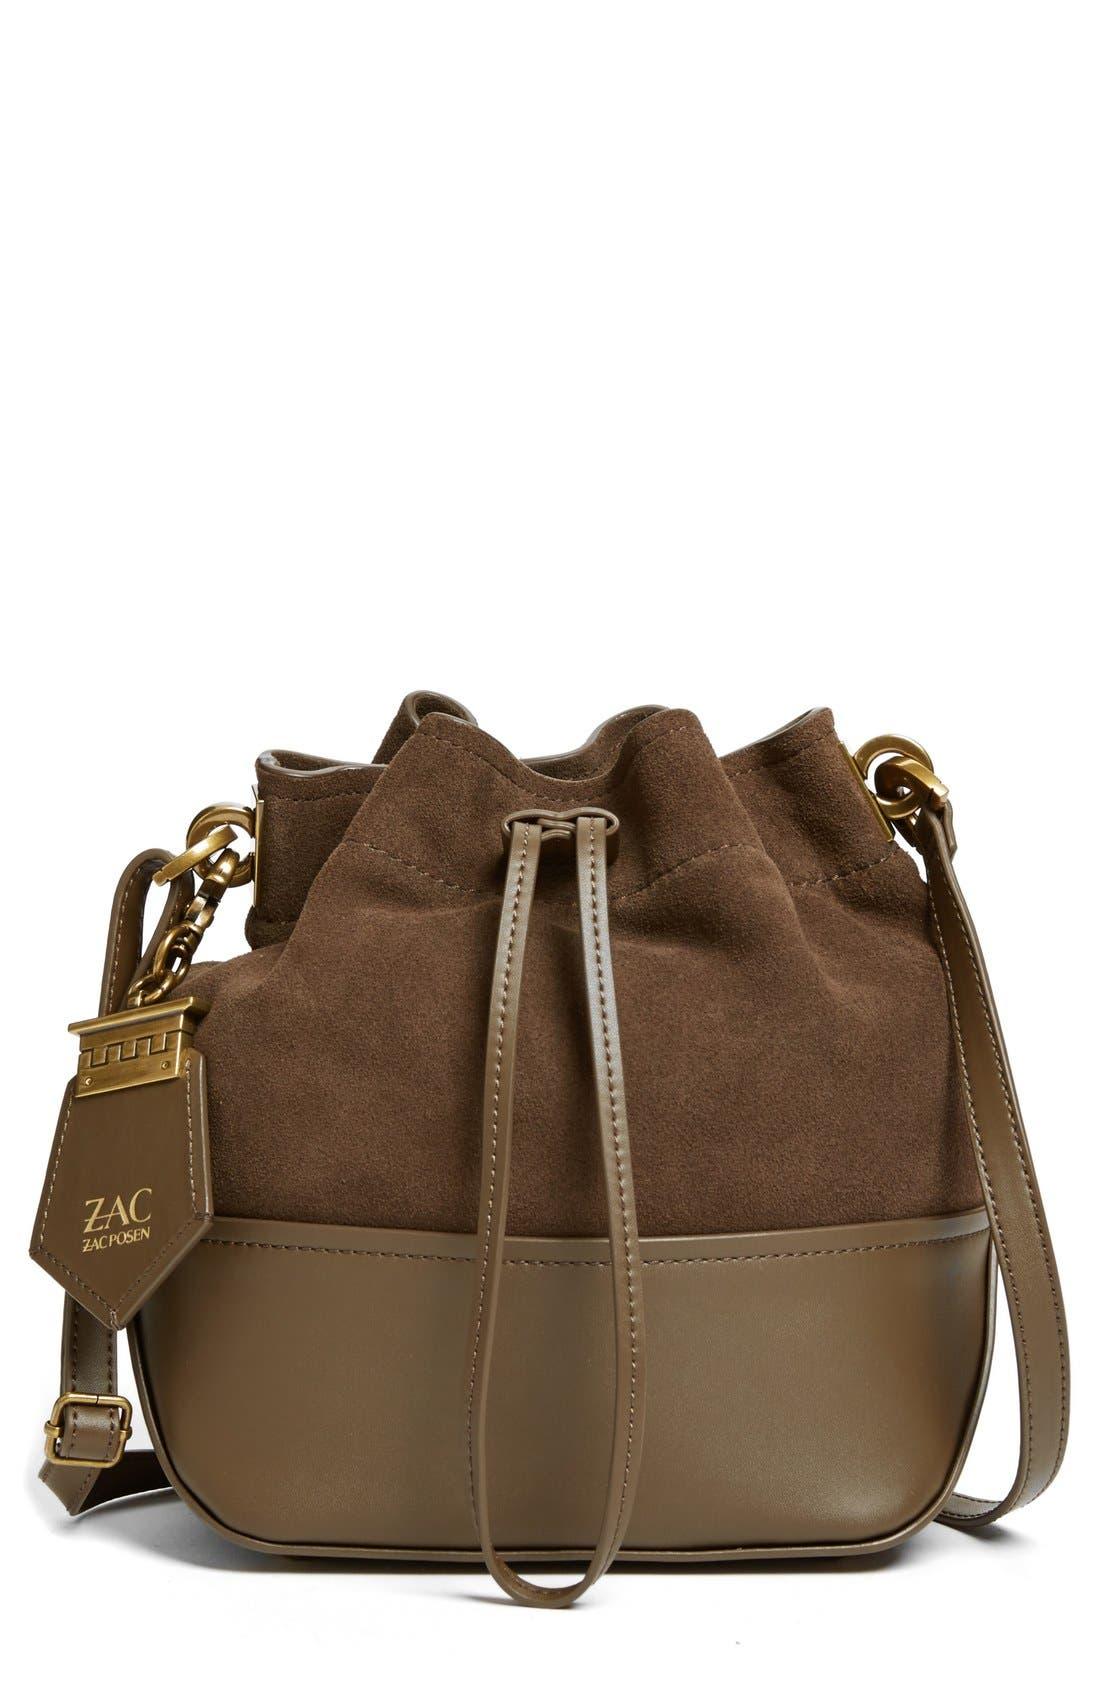 Main Image - ZAC Zac Posen 'Mini Eartha' Calfskin Bucket Bag